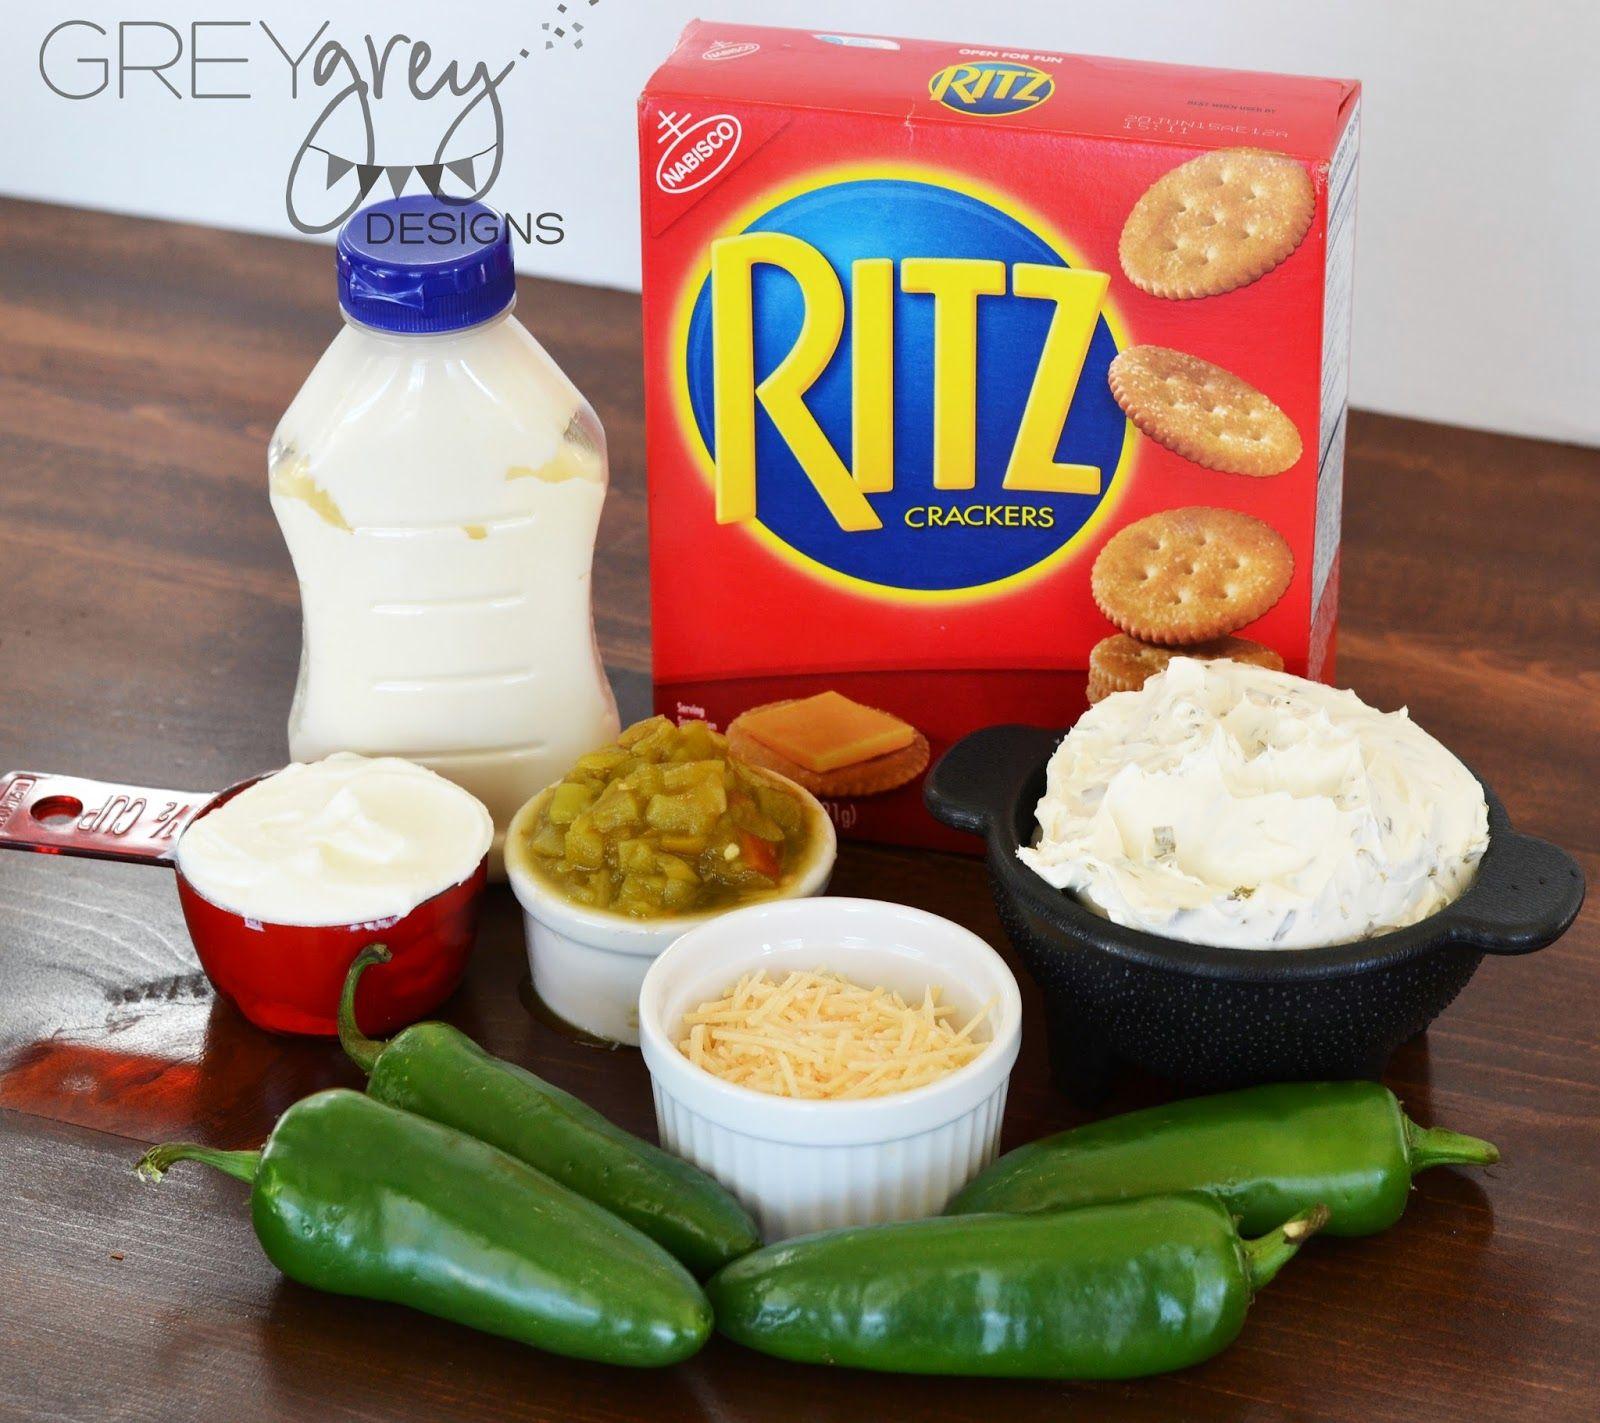 Hot Jalapeno Popper Dip with Ritz Crackers--GreyGrey Designs